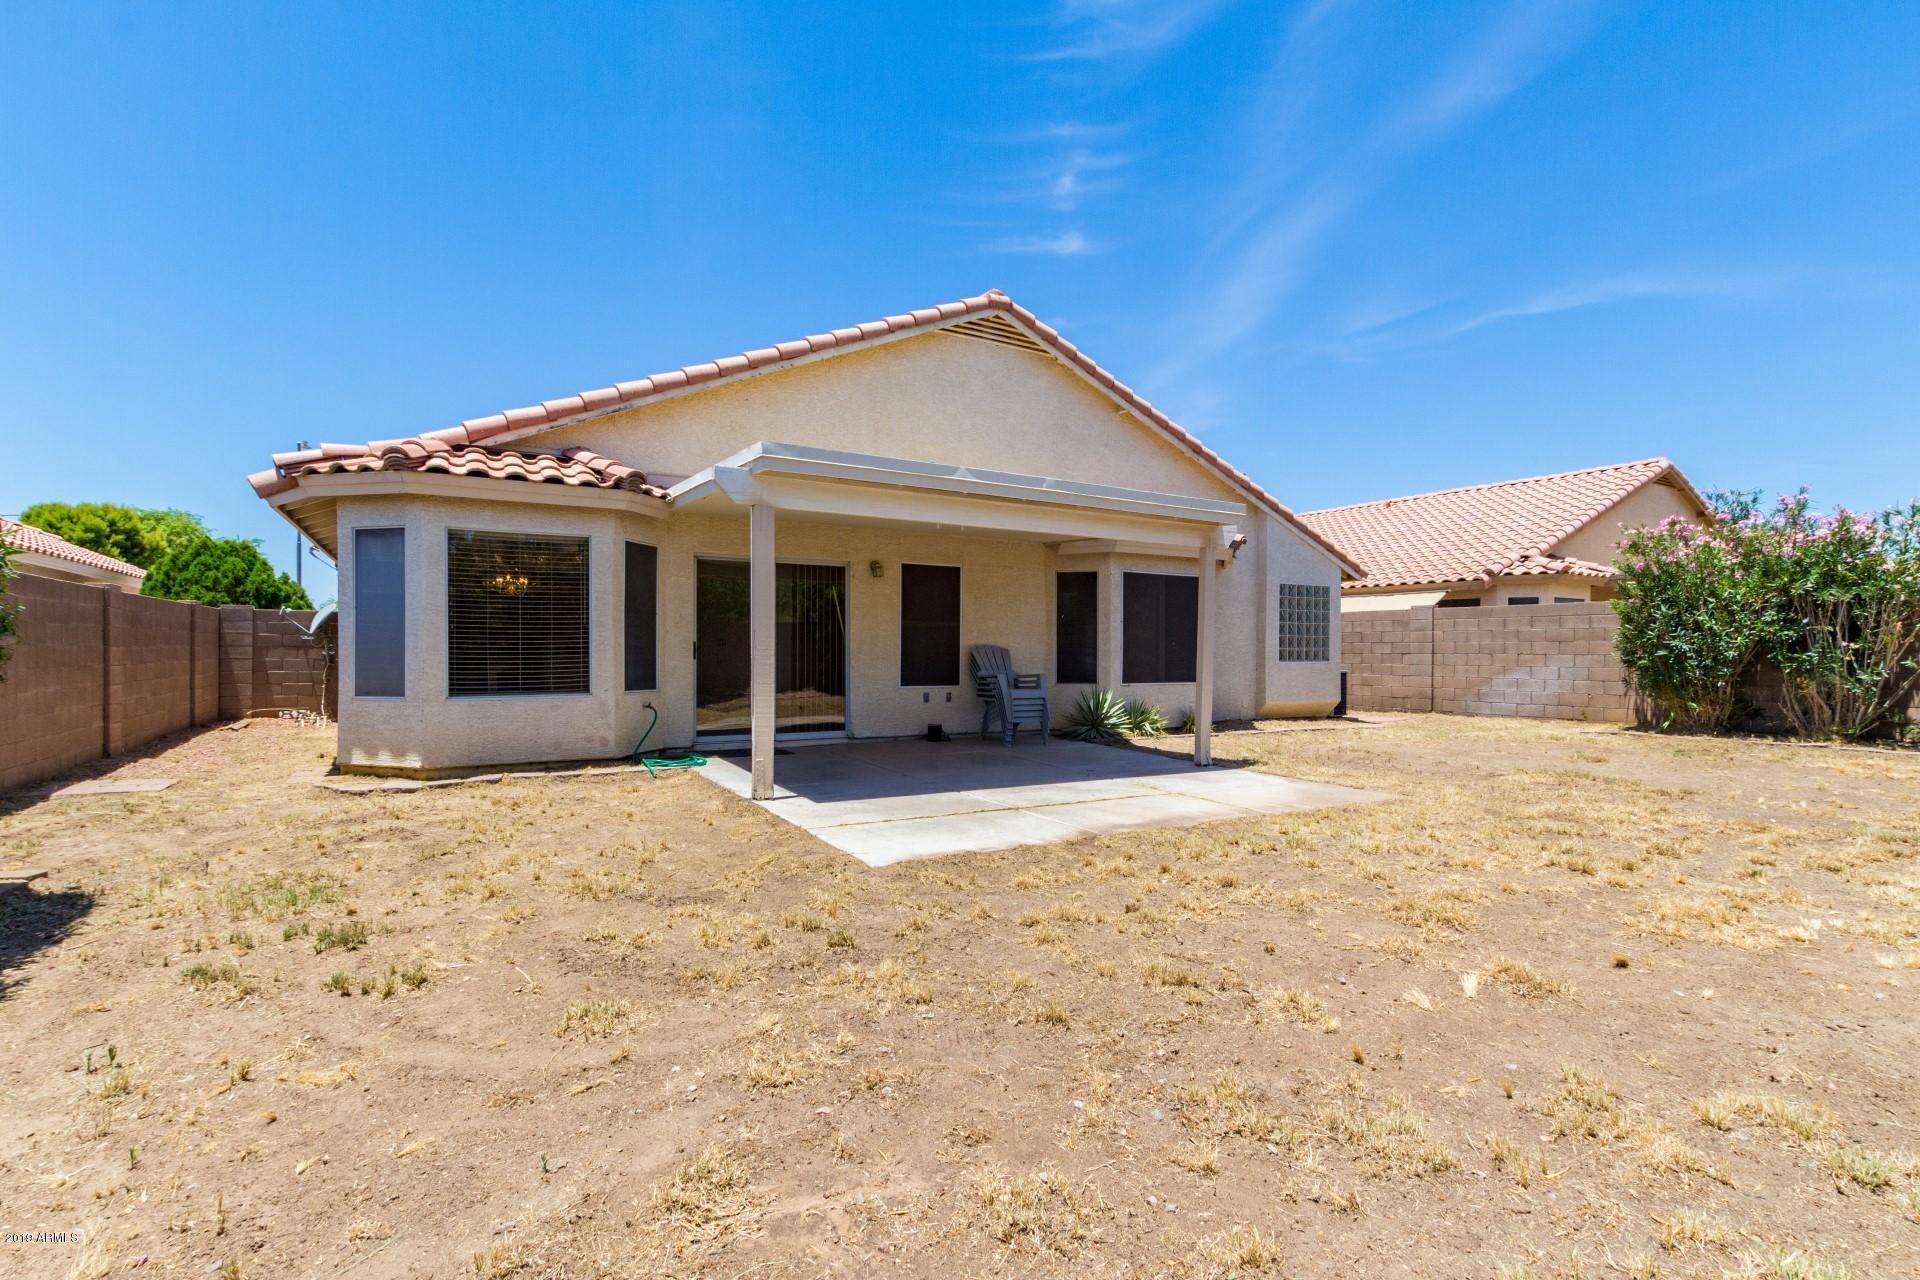 MLS 5941021 2615 N 123RD Avenue, Avondale, AZ 85392 Avondale AZ Rancho Santa Fe